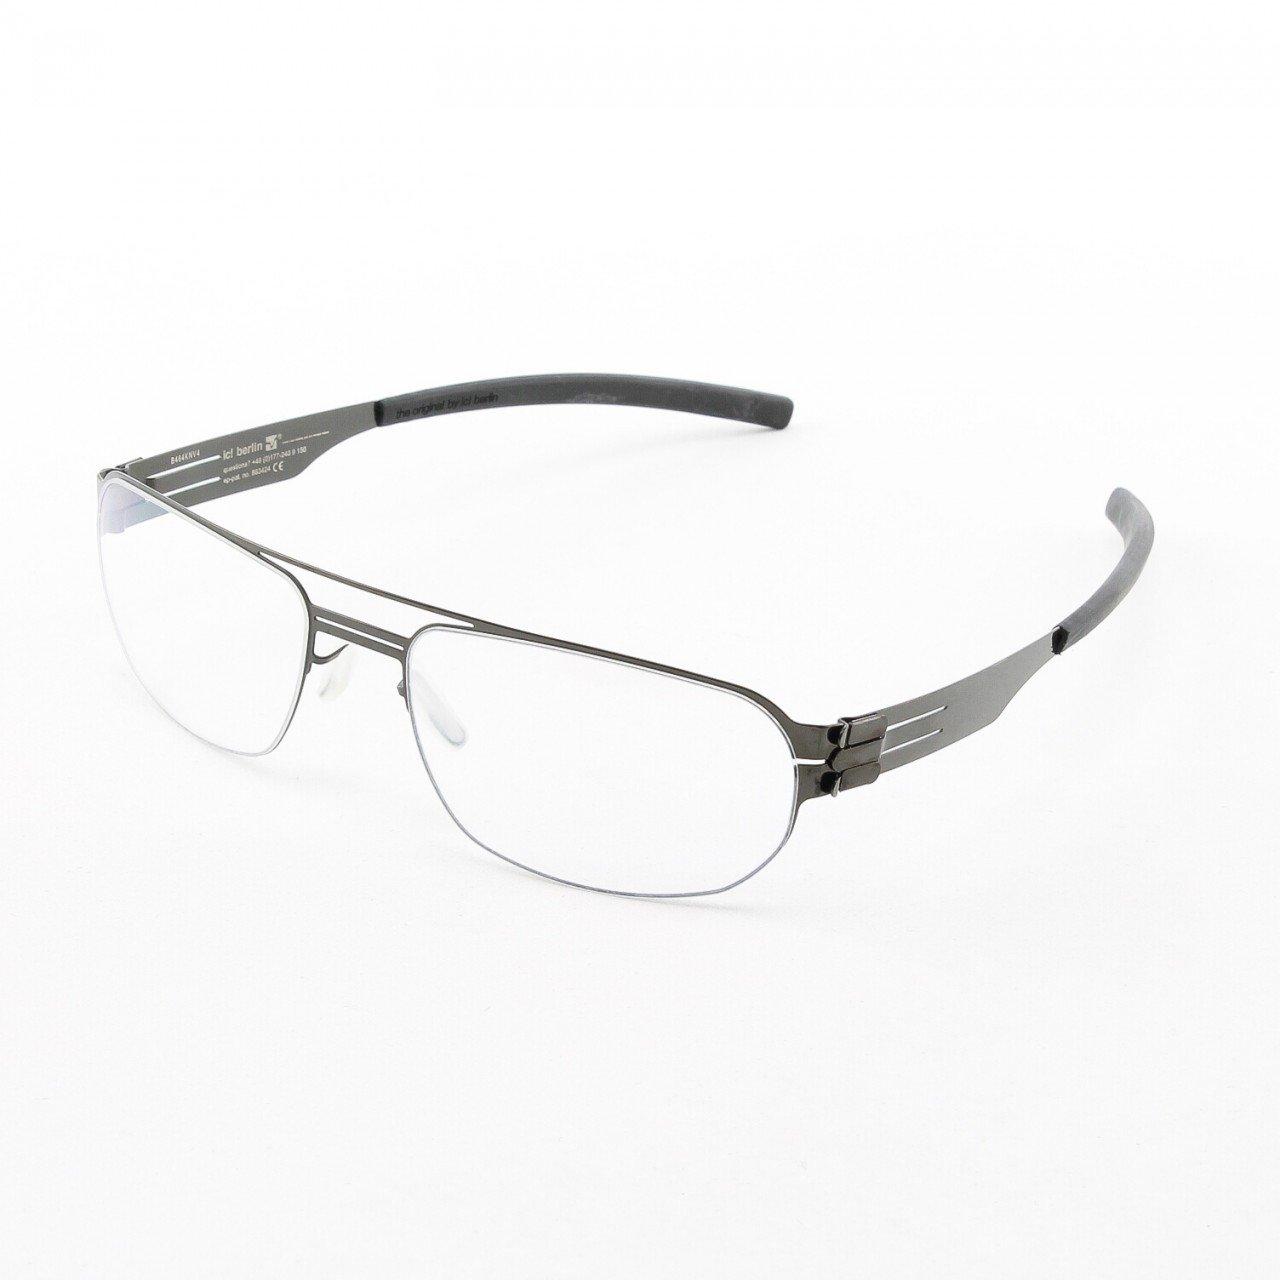 ic! Berlin Oleg P. Eyeglasses Col. Gun Metal with Clear Lenses